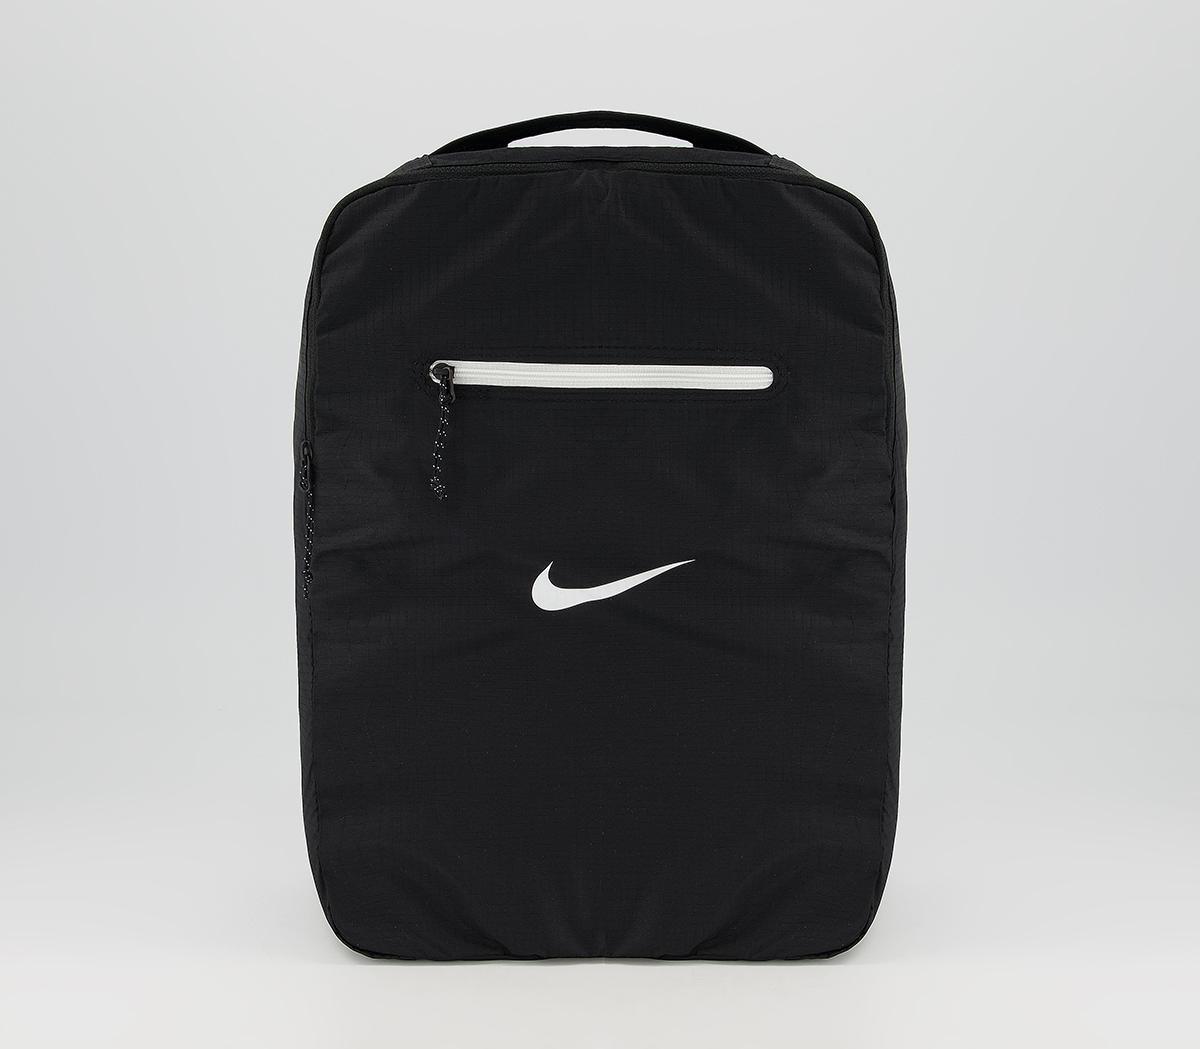 Stash Shoe Bag